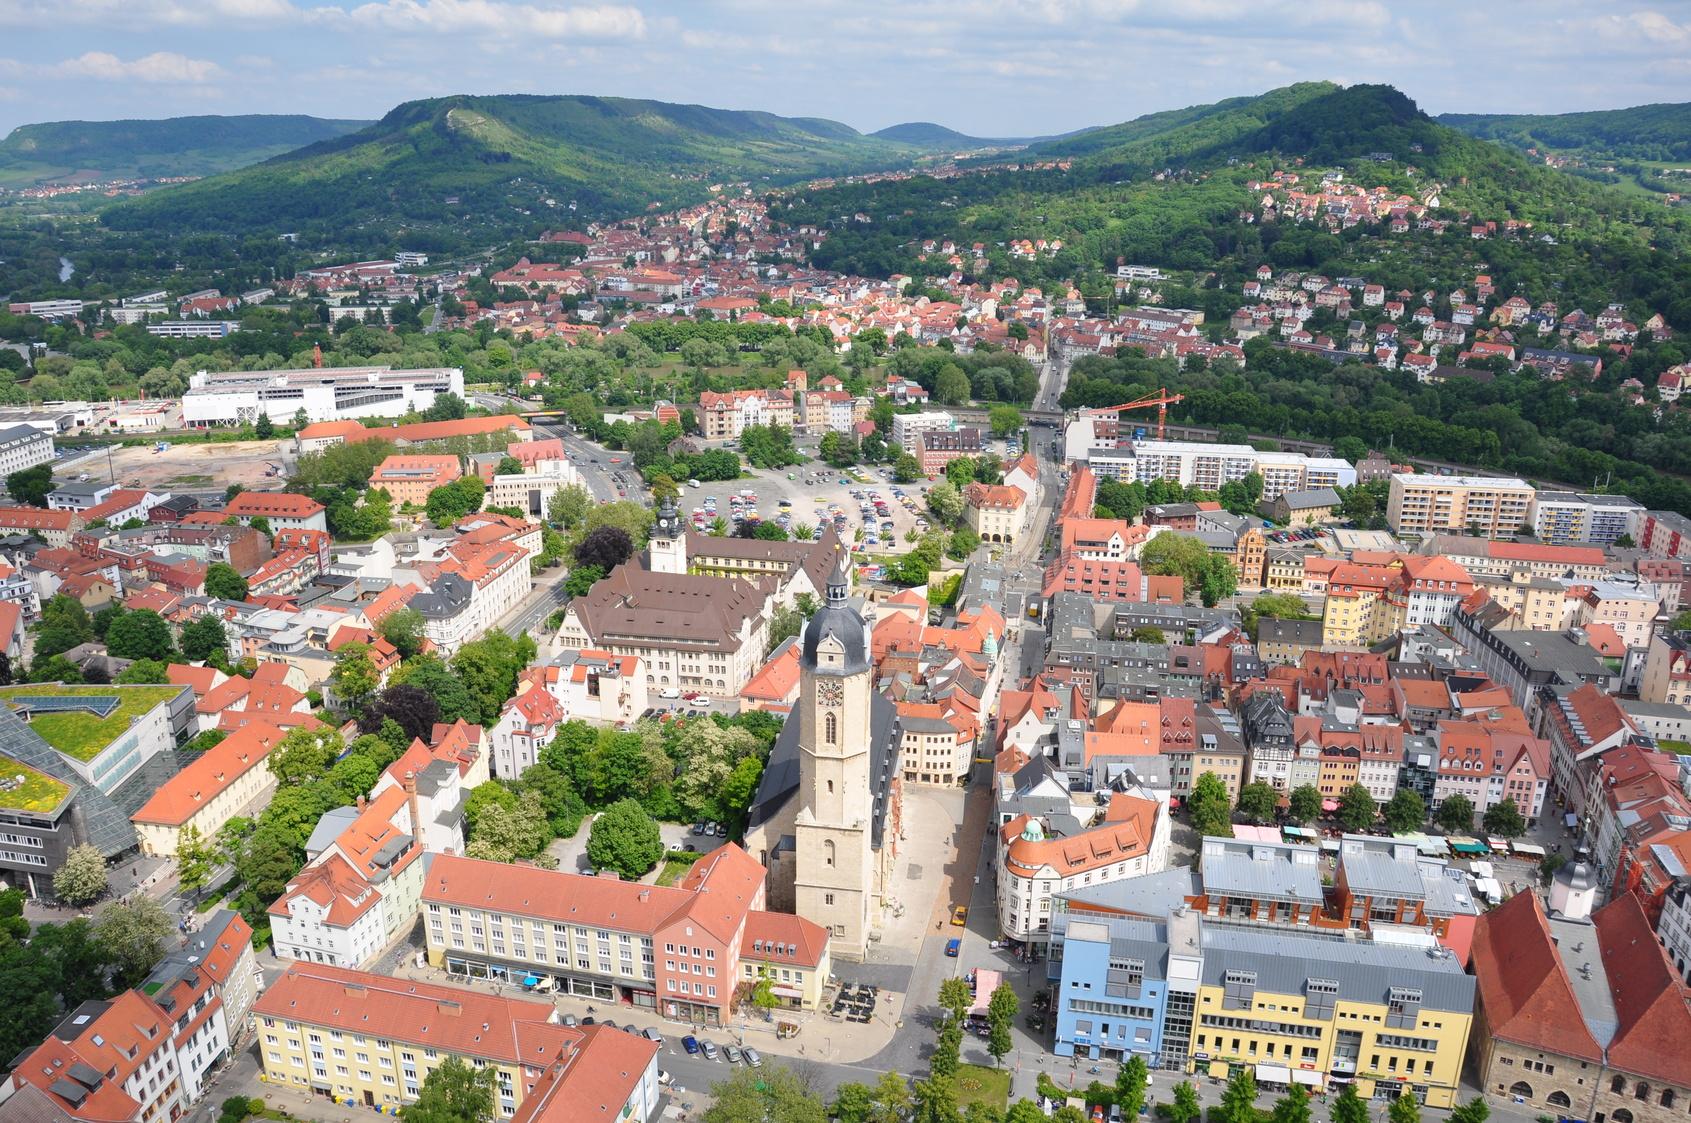 Jena Erfurt